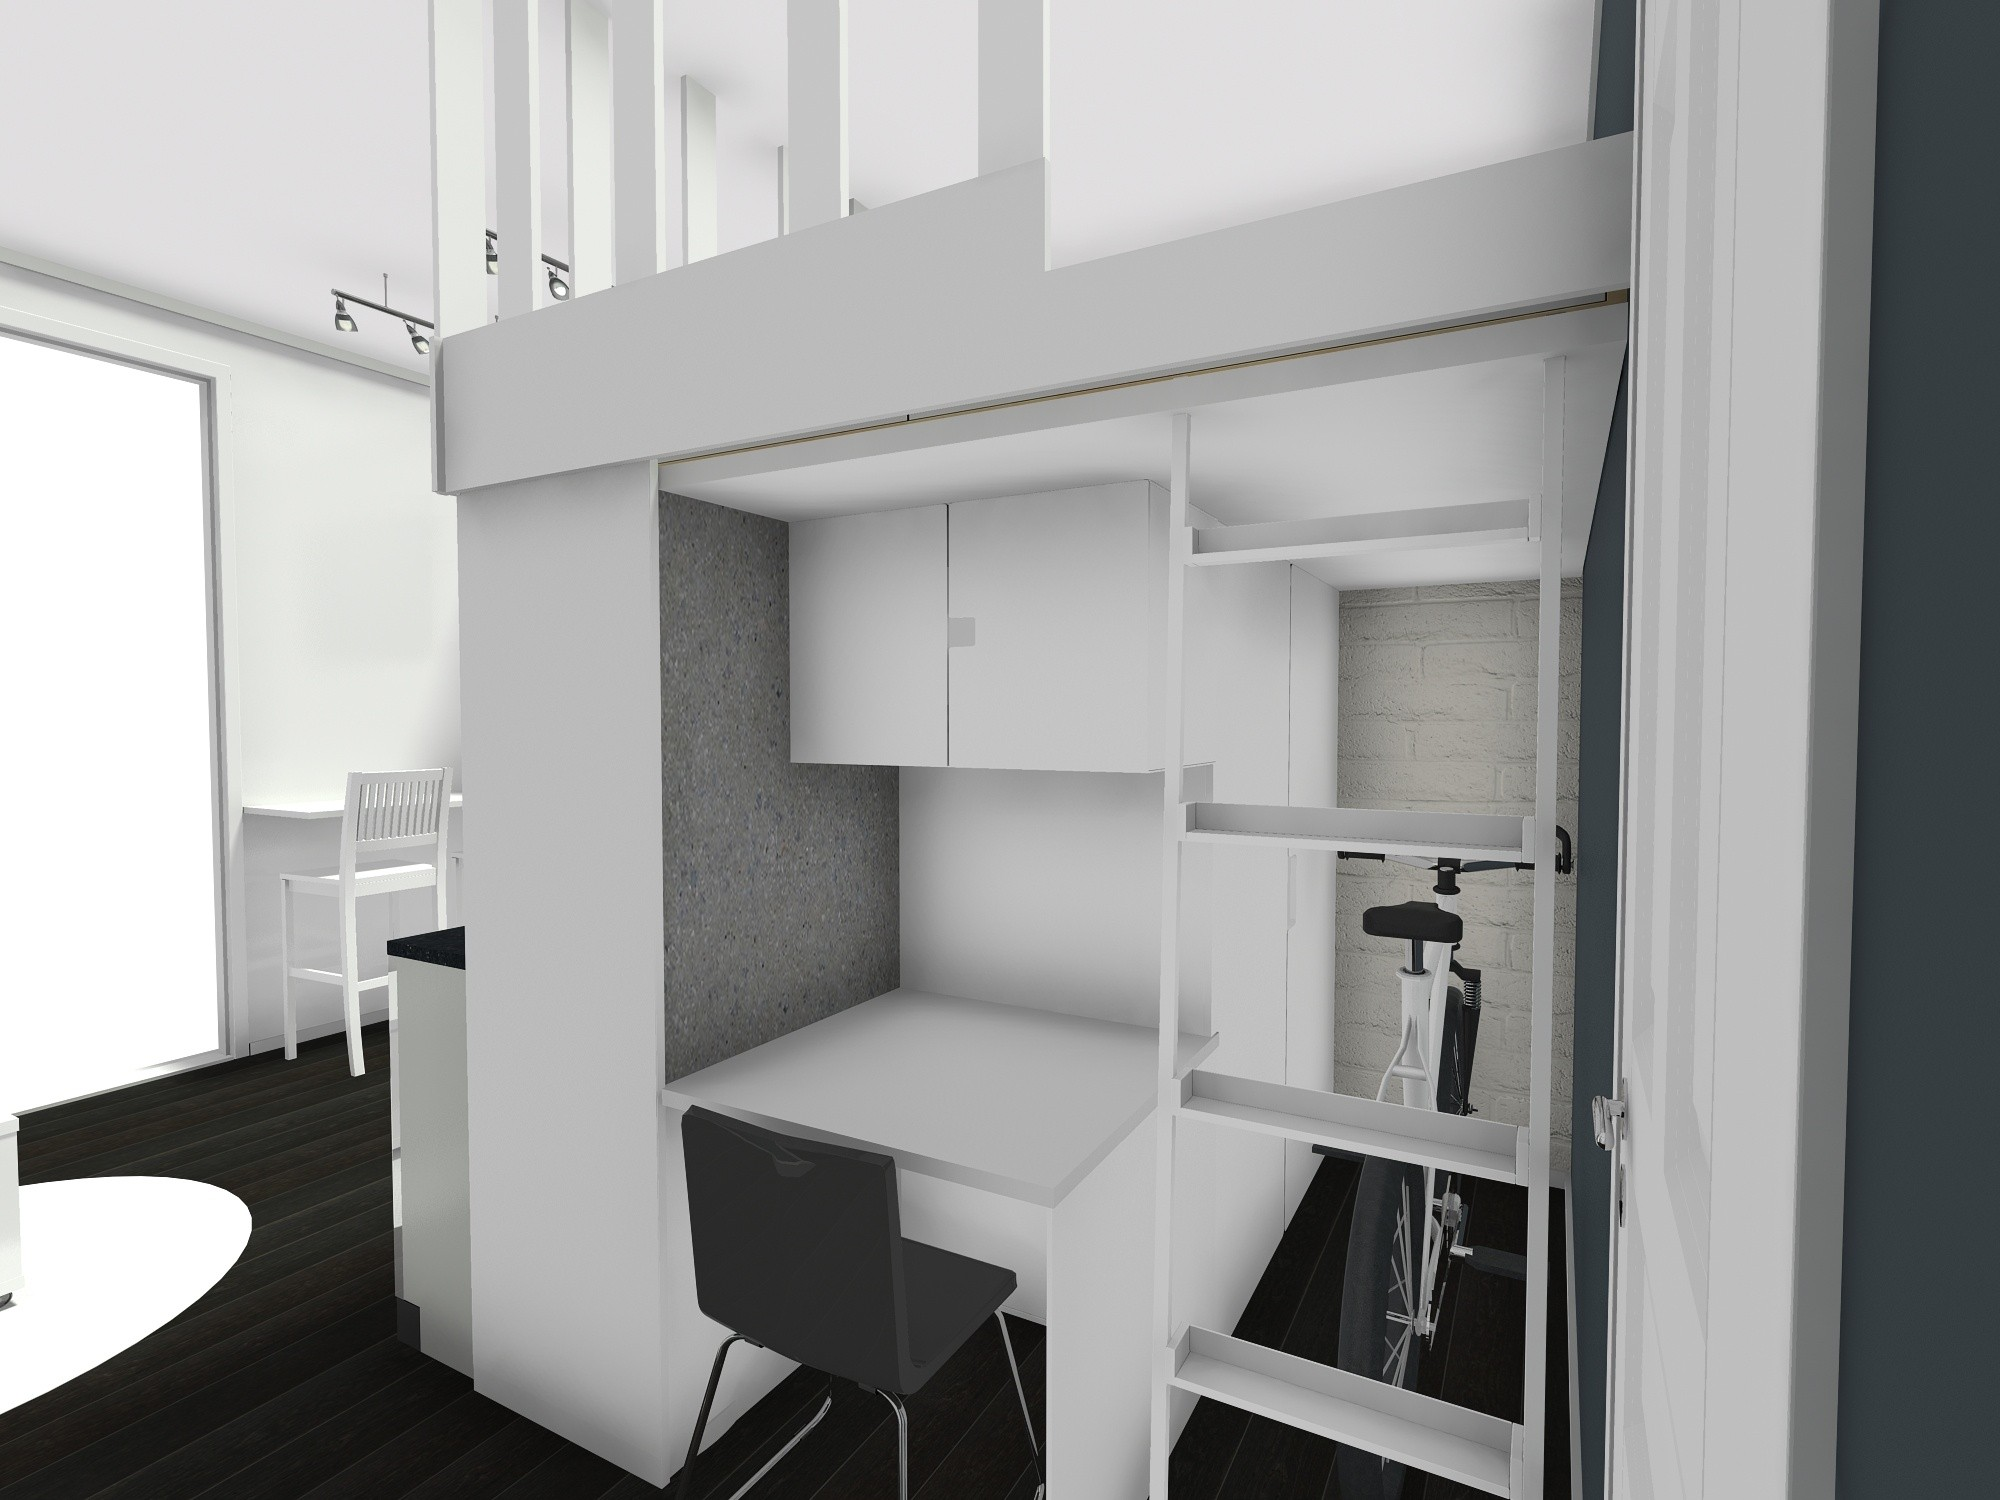 loft stan mikrostan visoki strop radni kutak